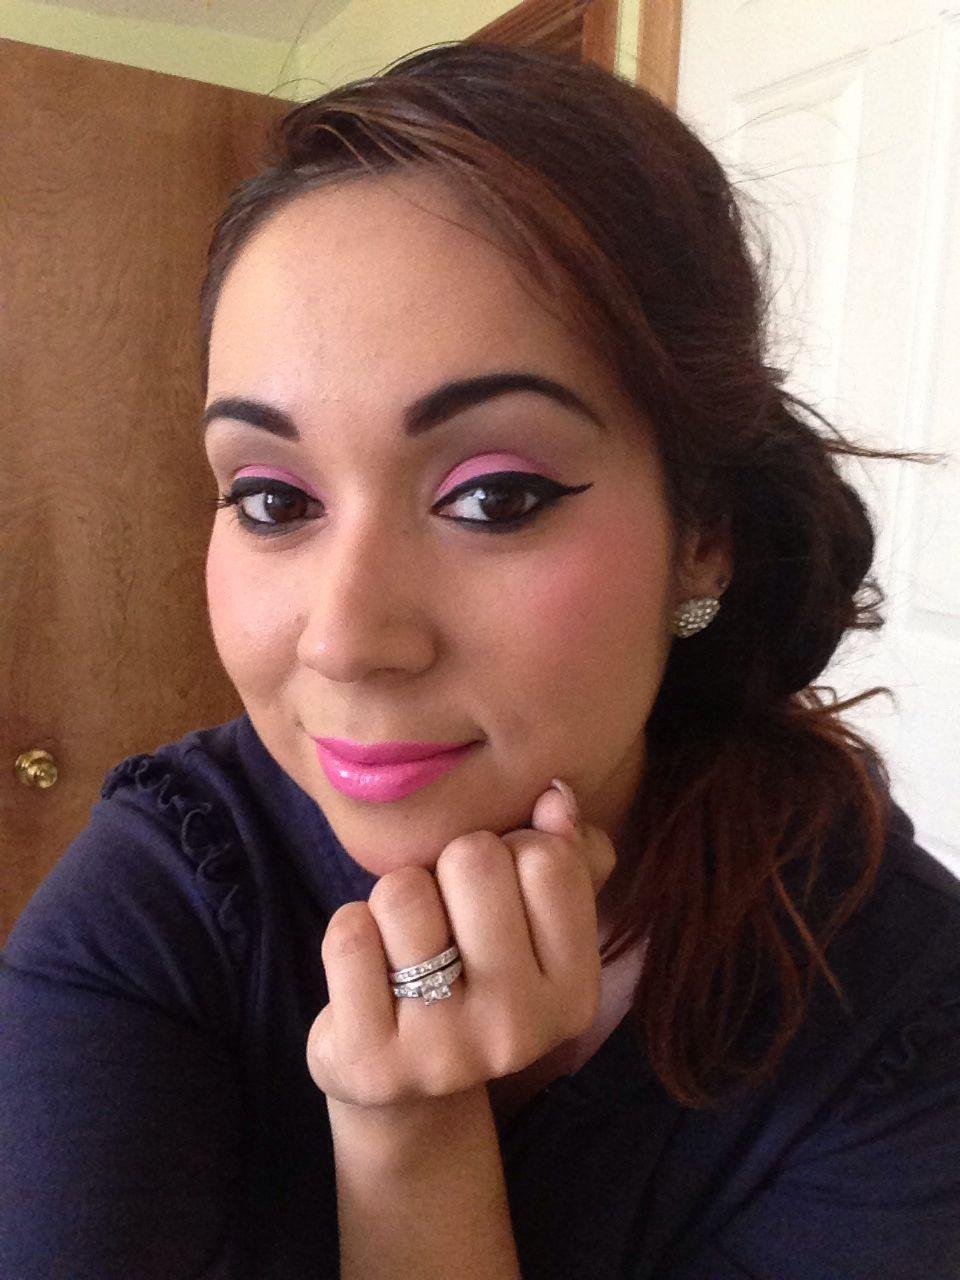 Mac eyeshadow (silly) and lipstick Mac ( silly)